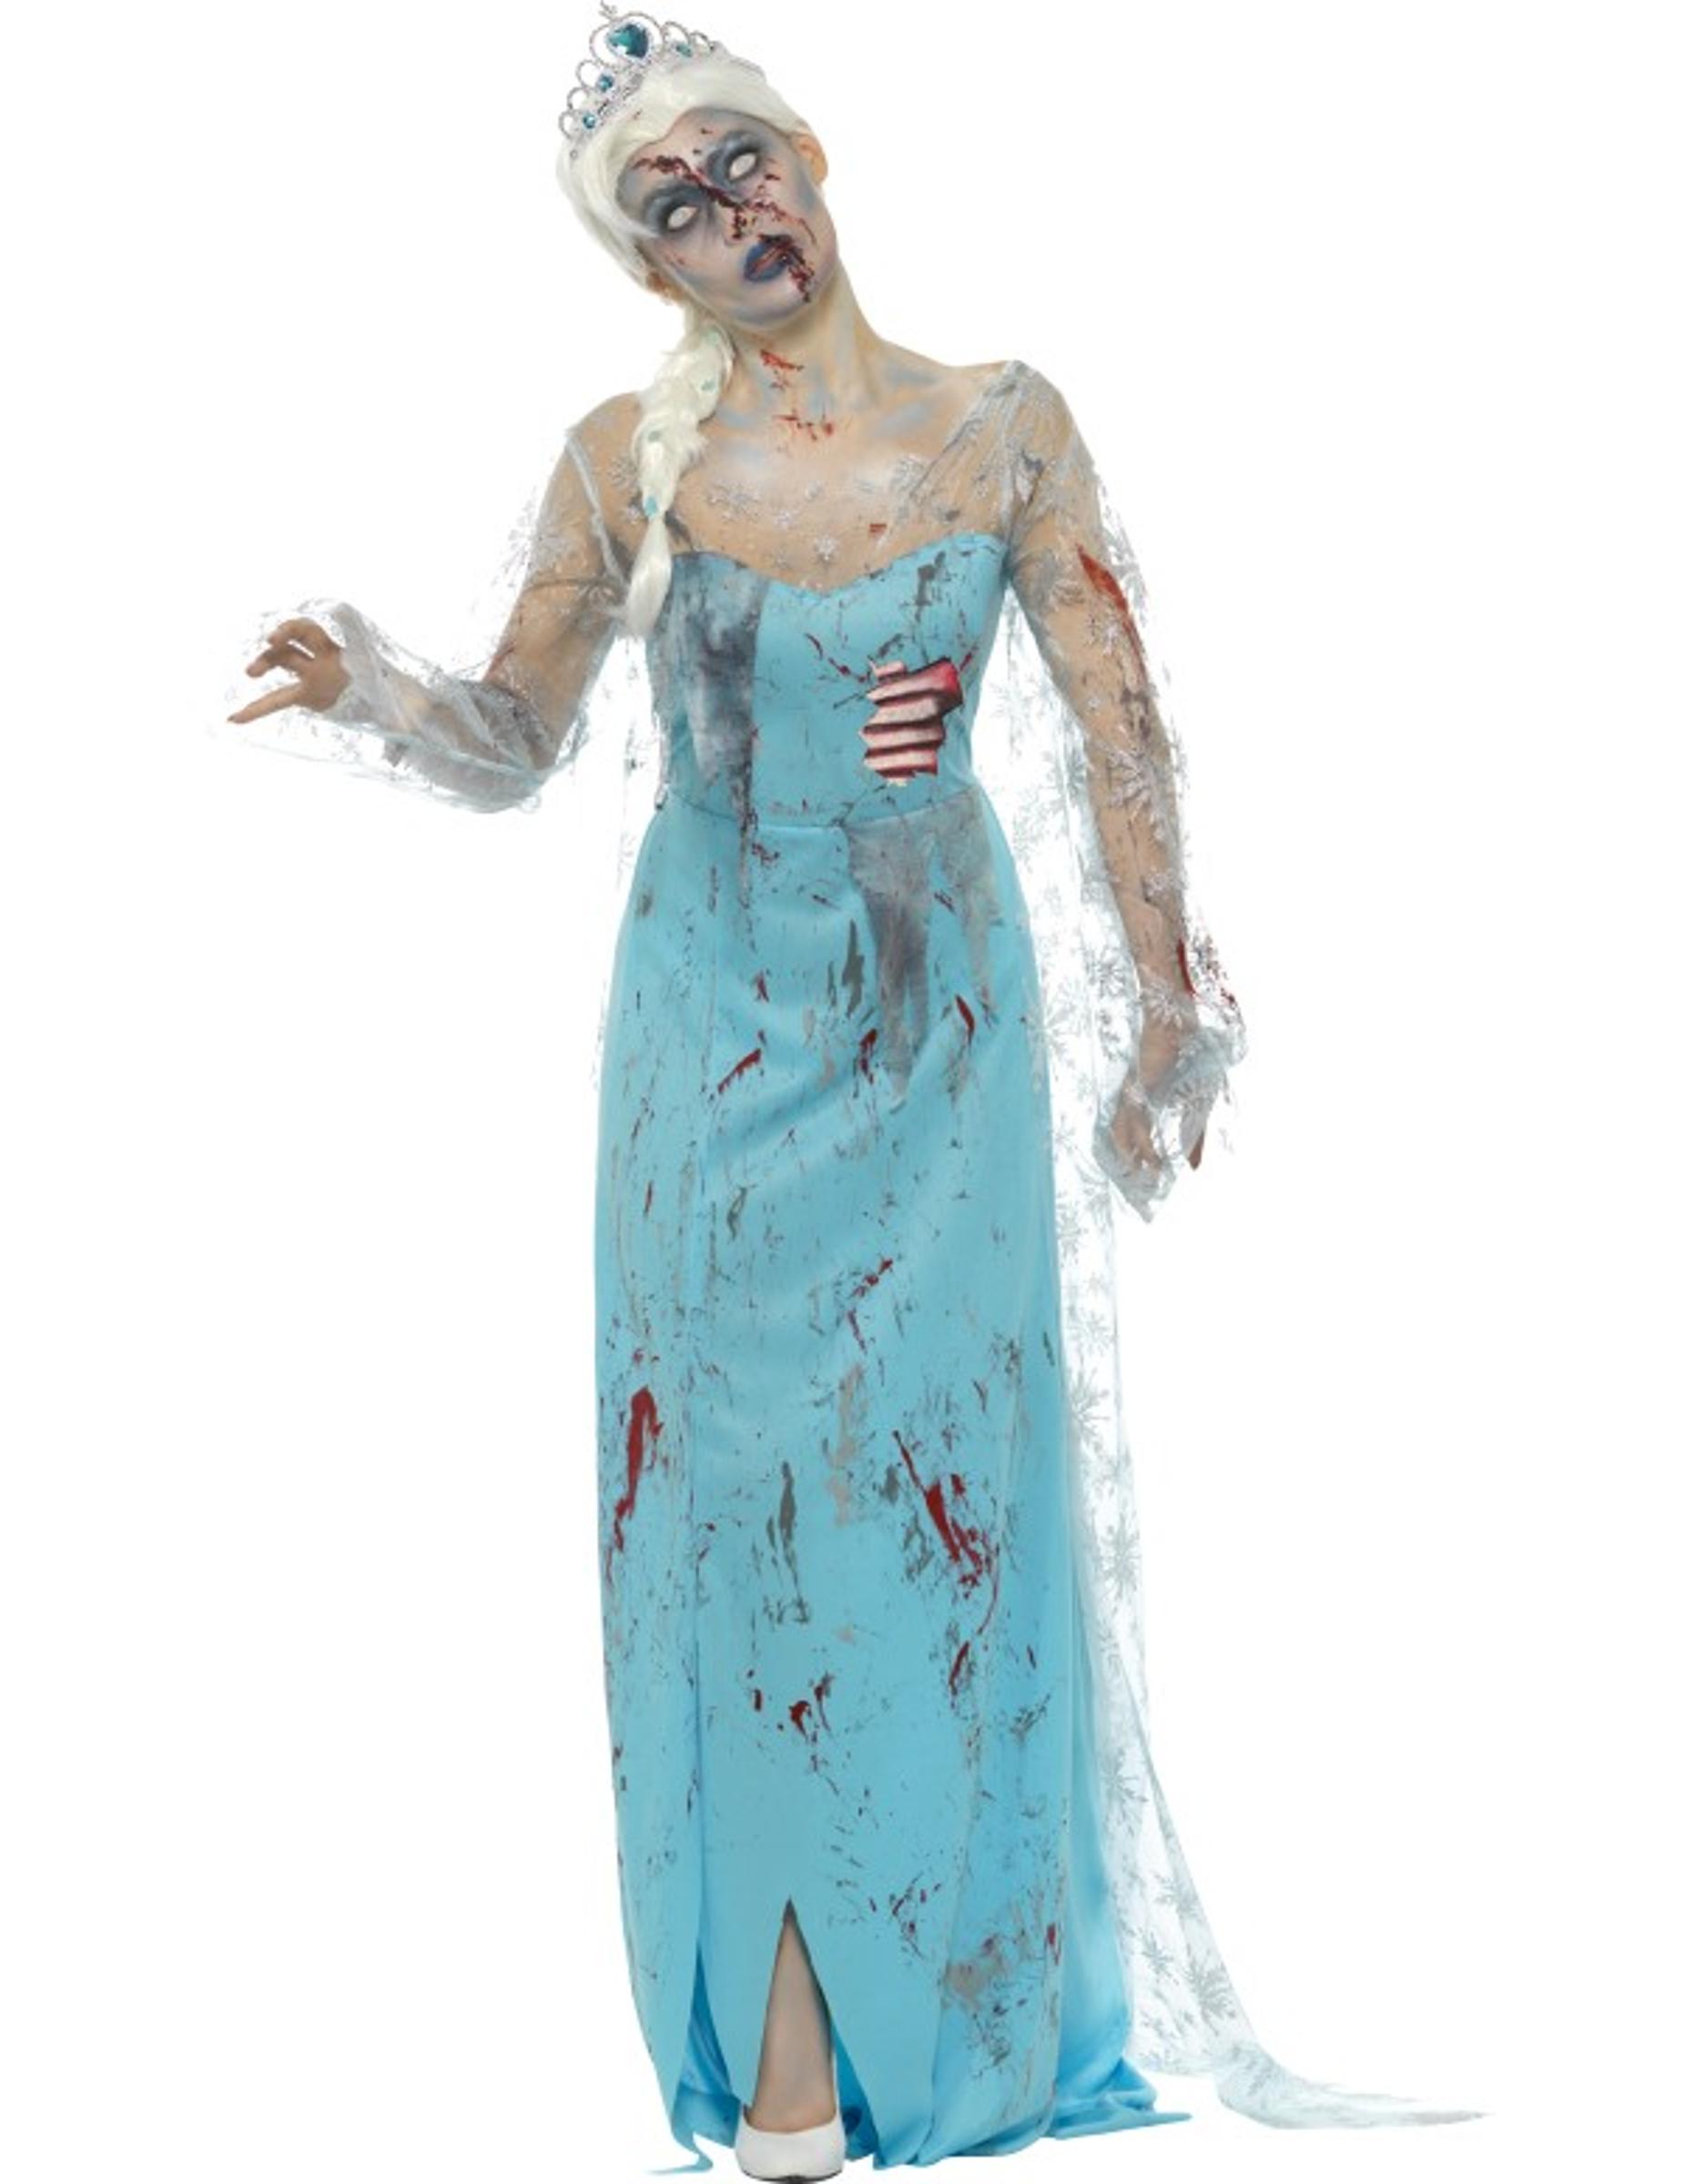 zombie halloween kost m gefrorene frau kost me f r erwachsene und g nstige faschingskost me. Black Bedroom Furniture Sets. Home Design Ideas